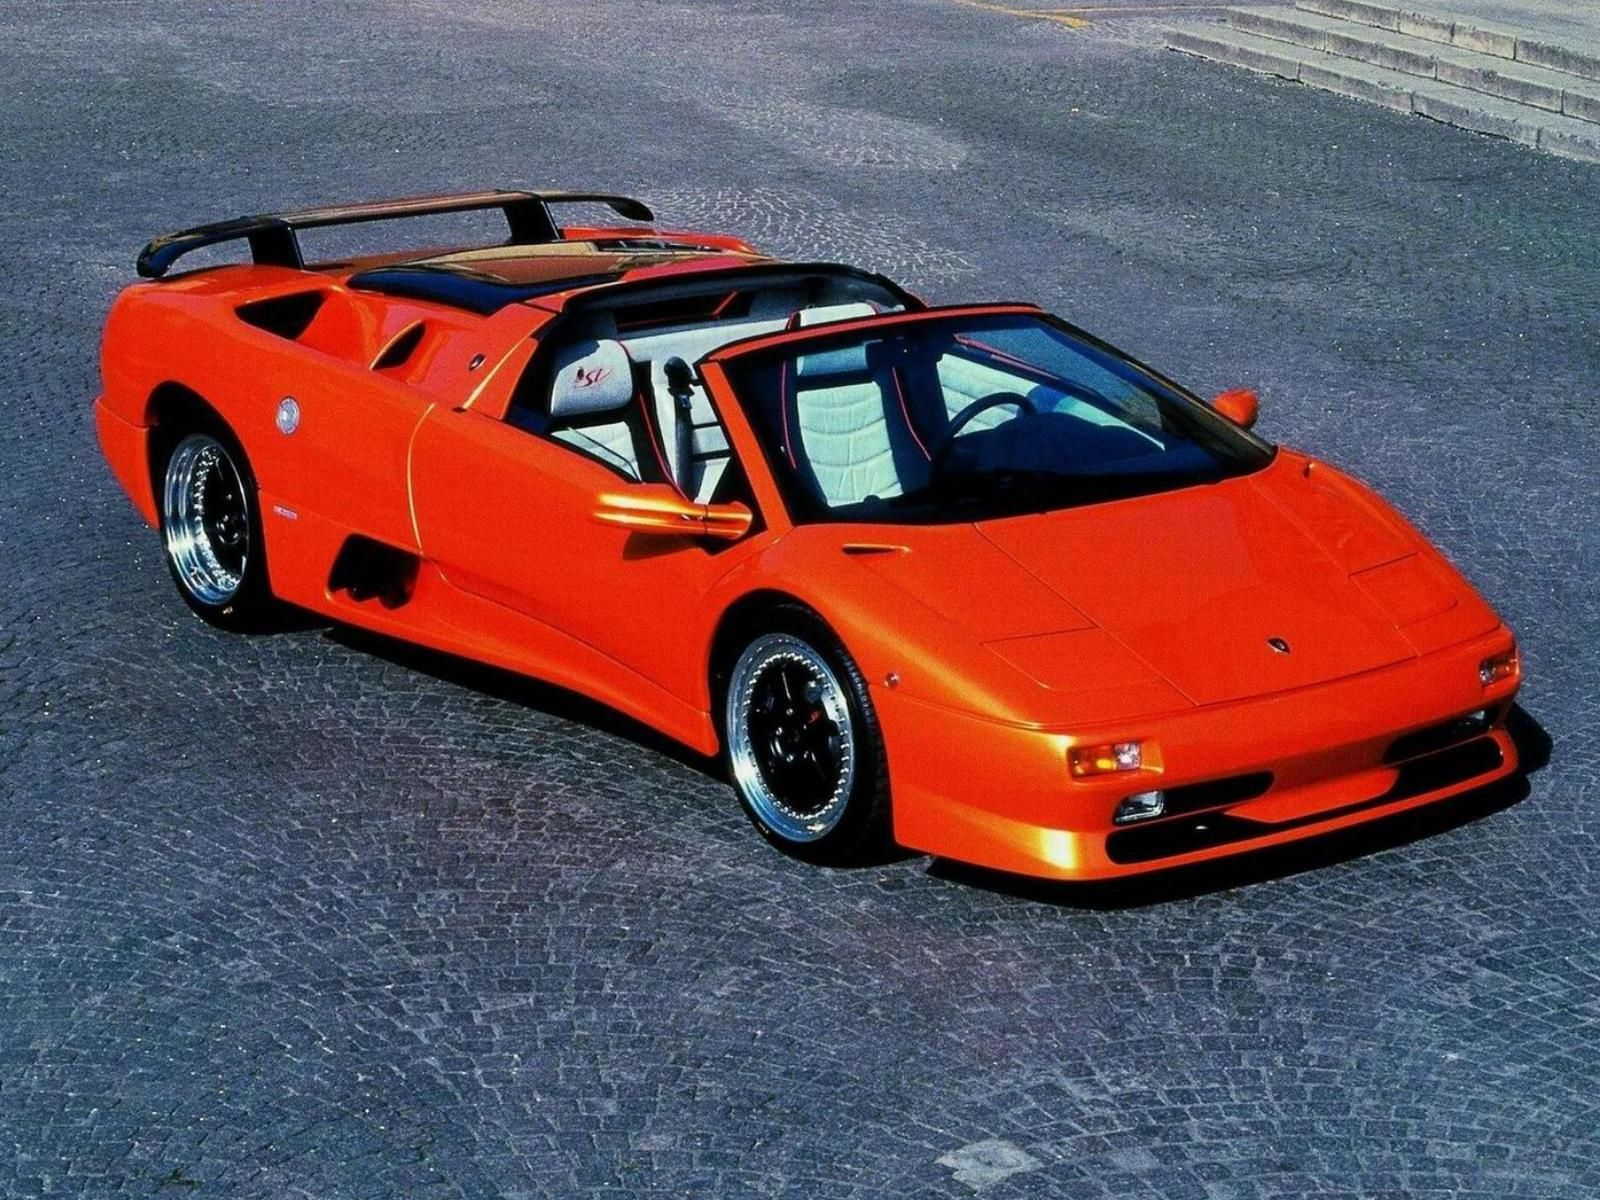 Lamborghini Diablo This Diablo In Orange Was The Devil Of The Road